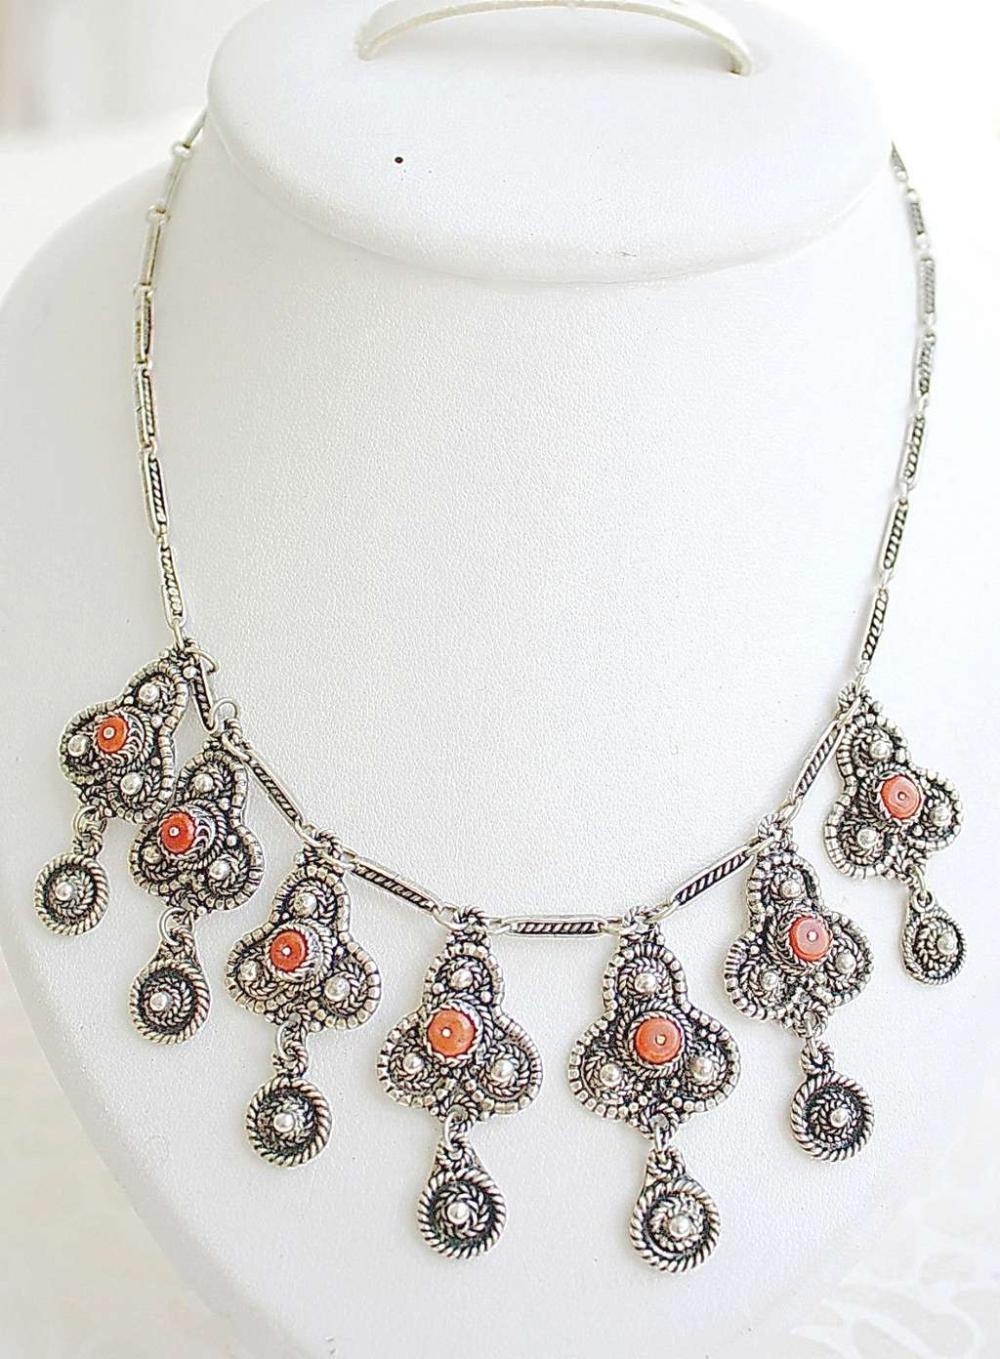 Bezalel Yemenite filigree silver sterling 935 old wedding necklace set with coral, 38gr.